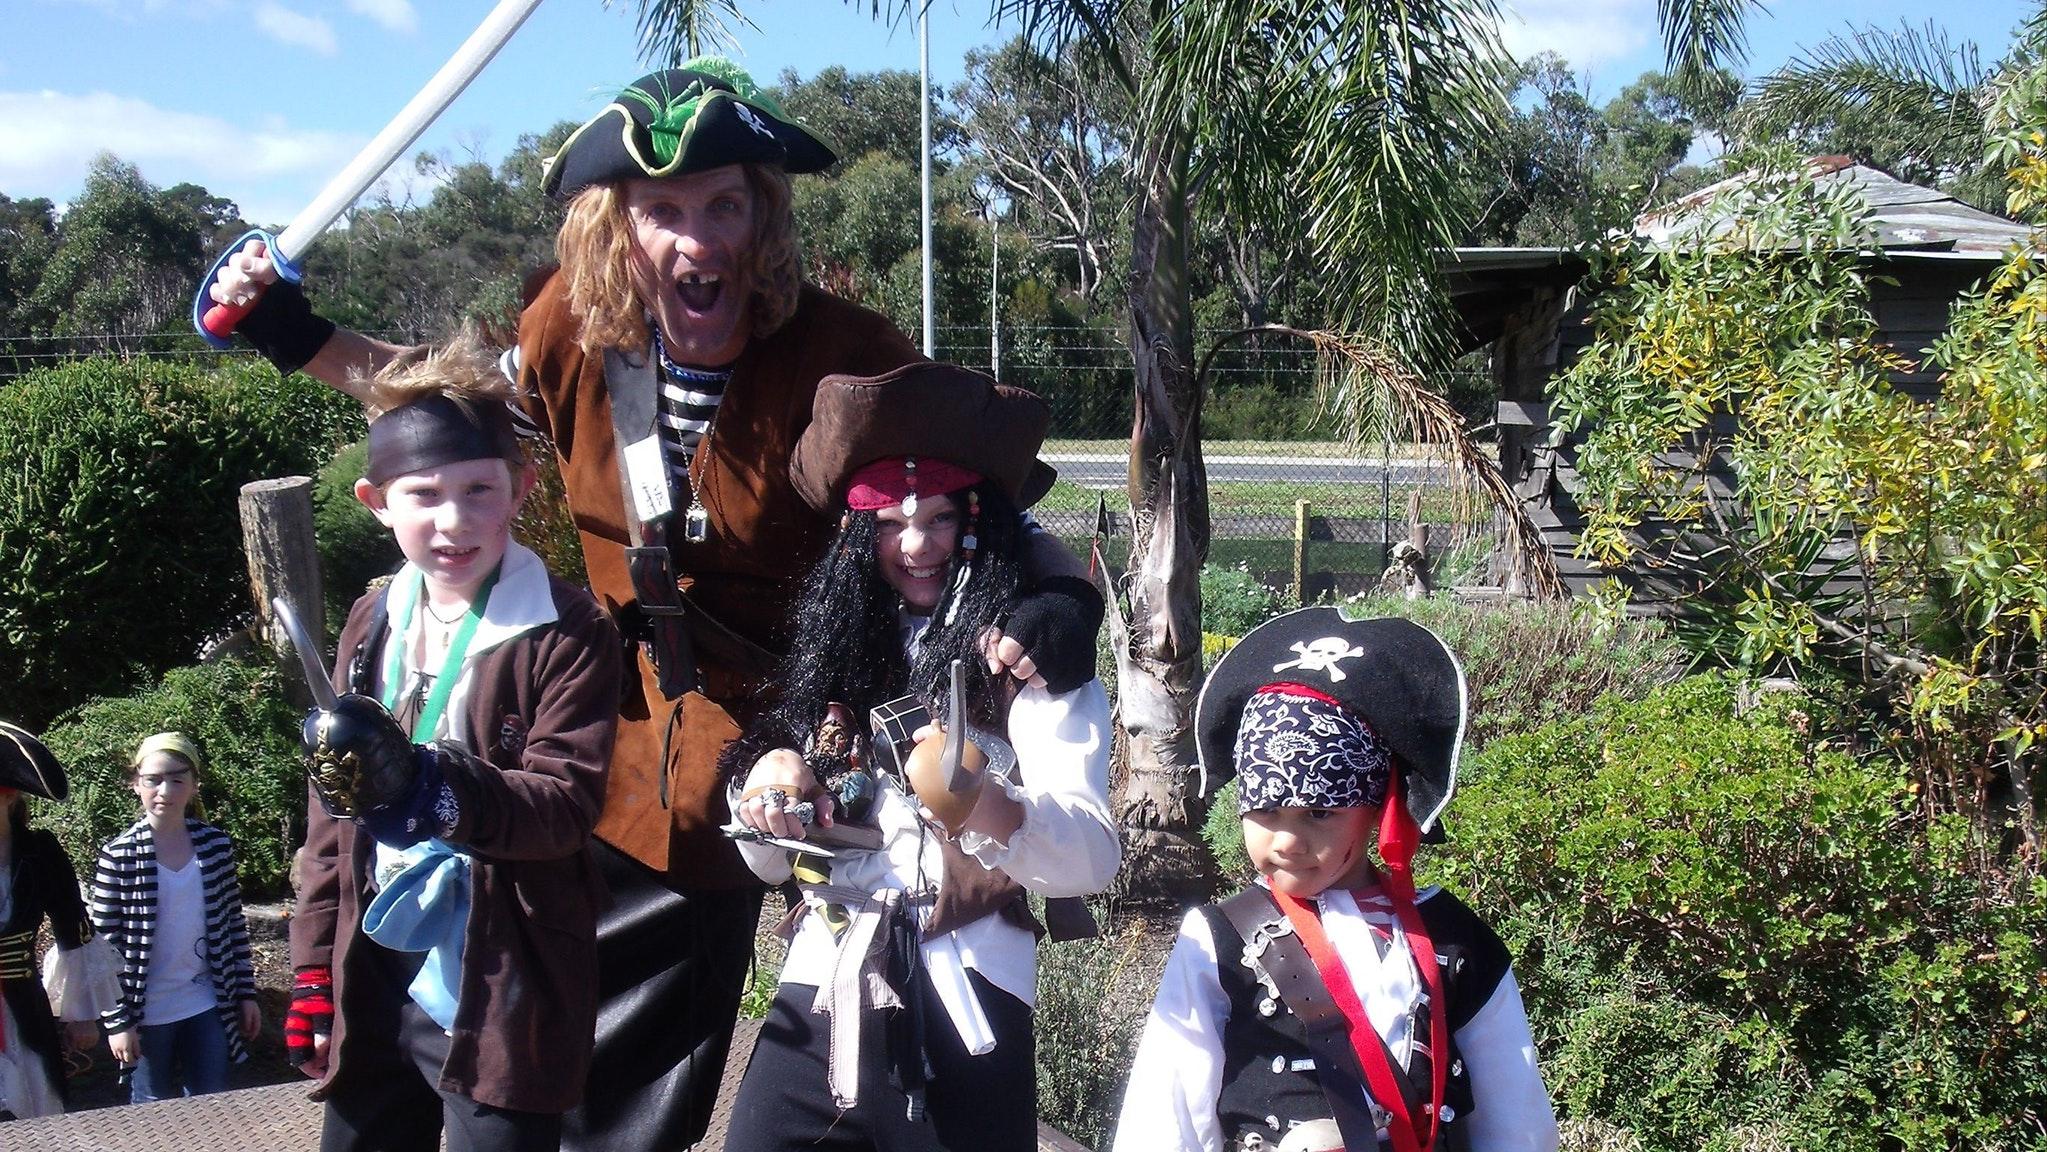 Best Dressed Pirates